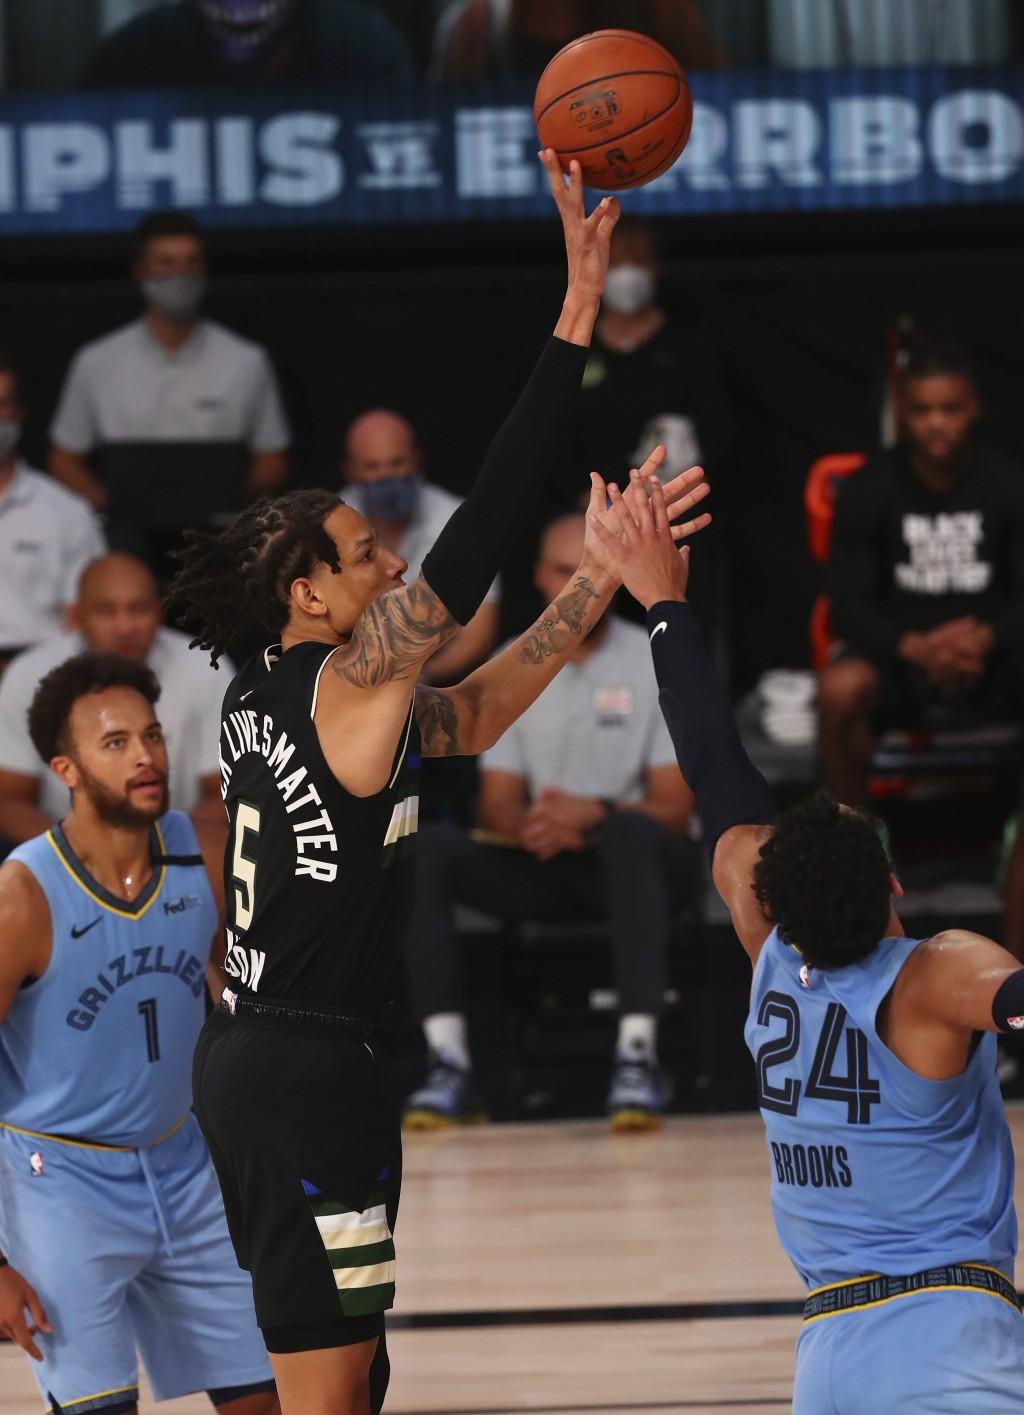 Milwaukee Bucks forward D.J. Wilson (5) shoots against Memphis Grizzlies guard Dillon Brooks (24) in the second half of an NBA basketball game Thursda...